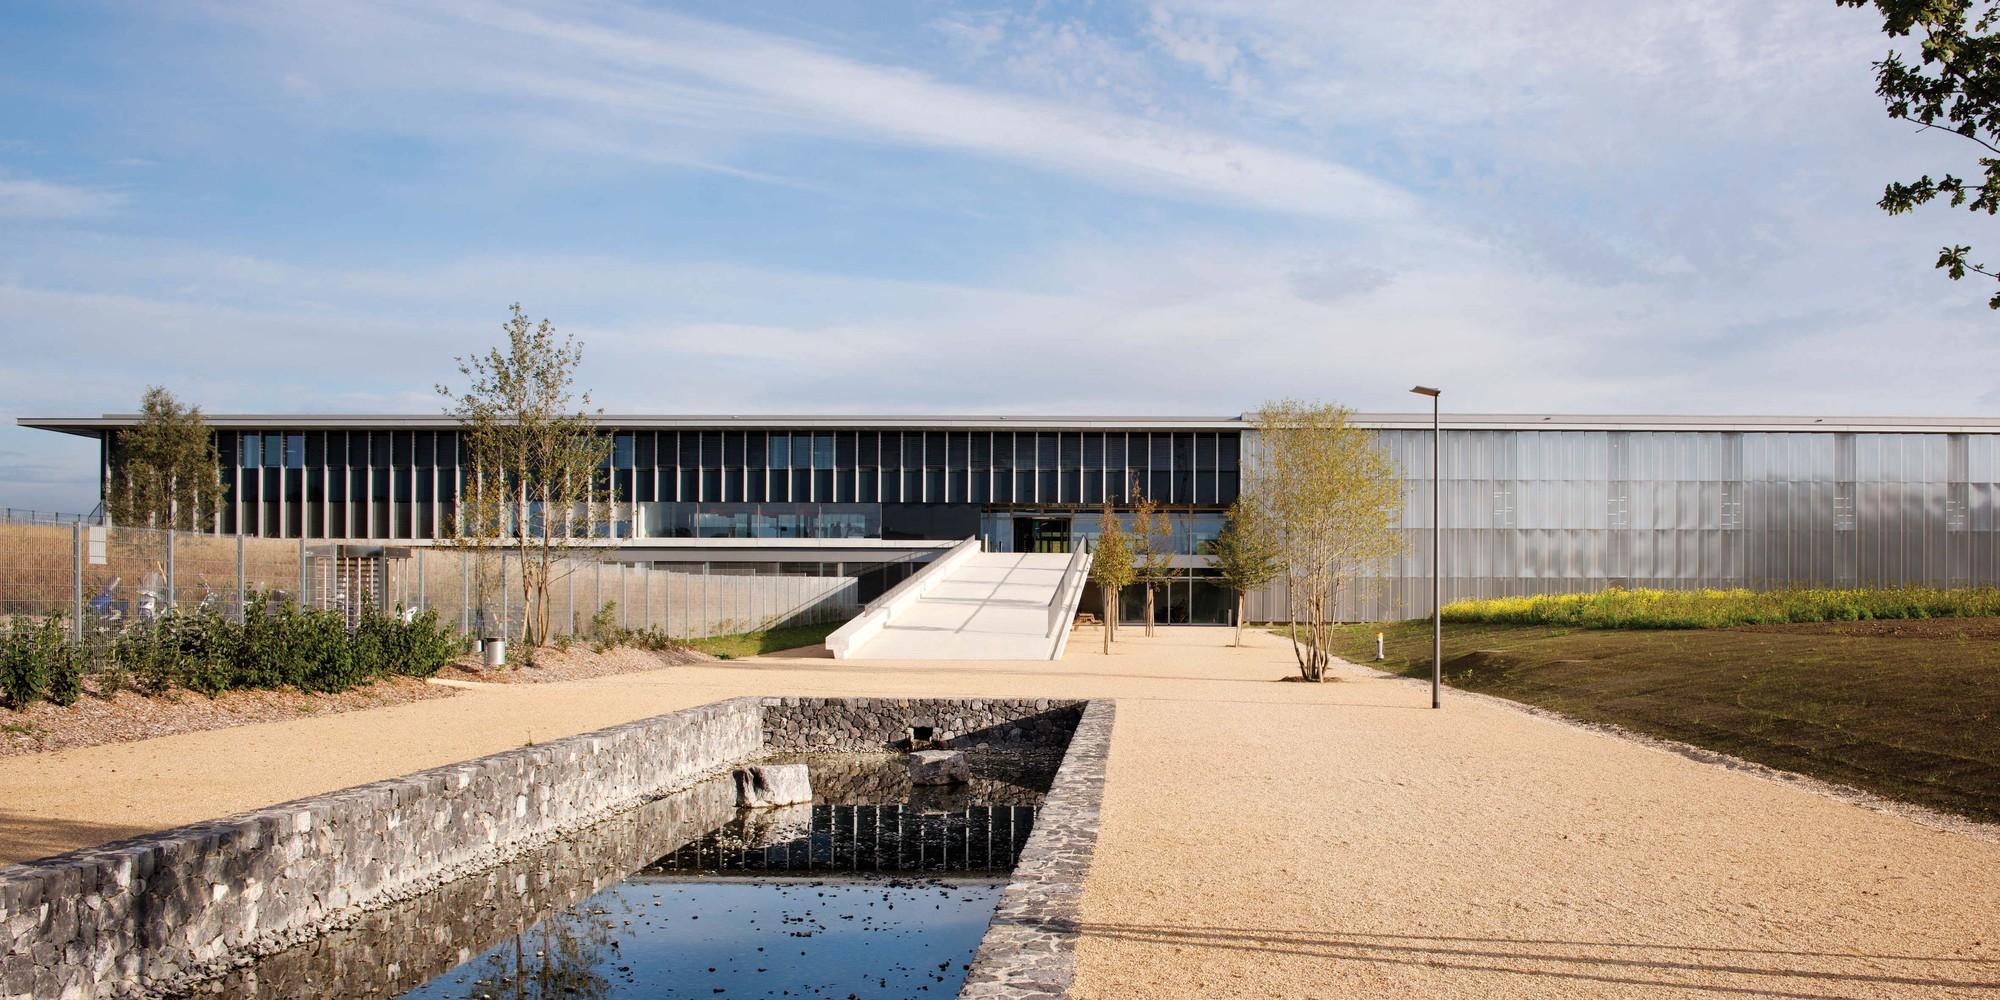 Galeria de complexo industrial bobst richter dahl rocha for Bo architecture 4 1